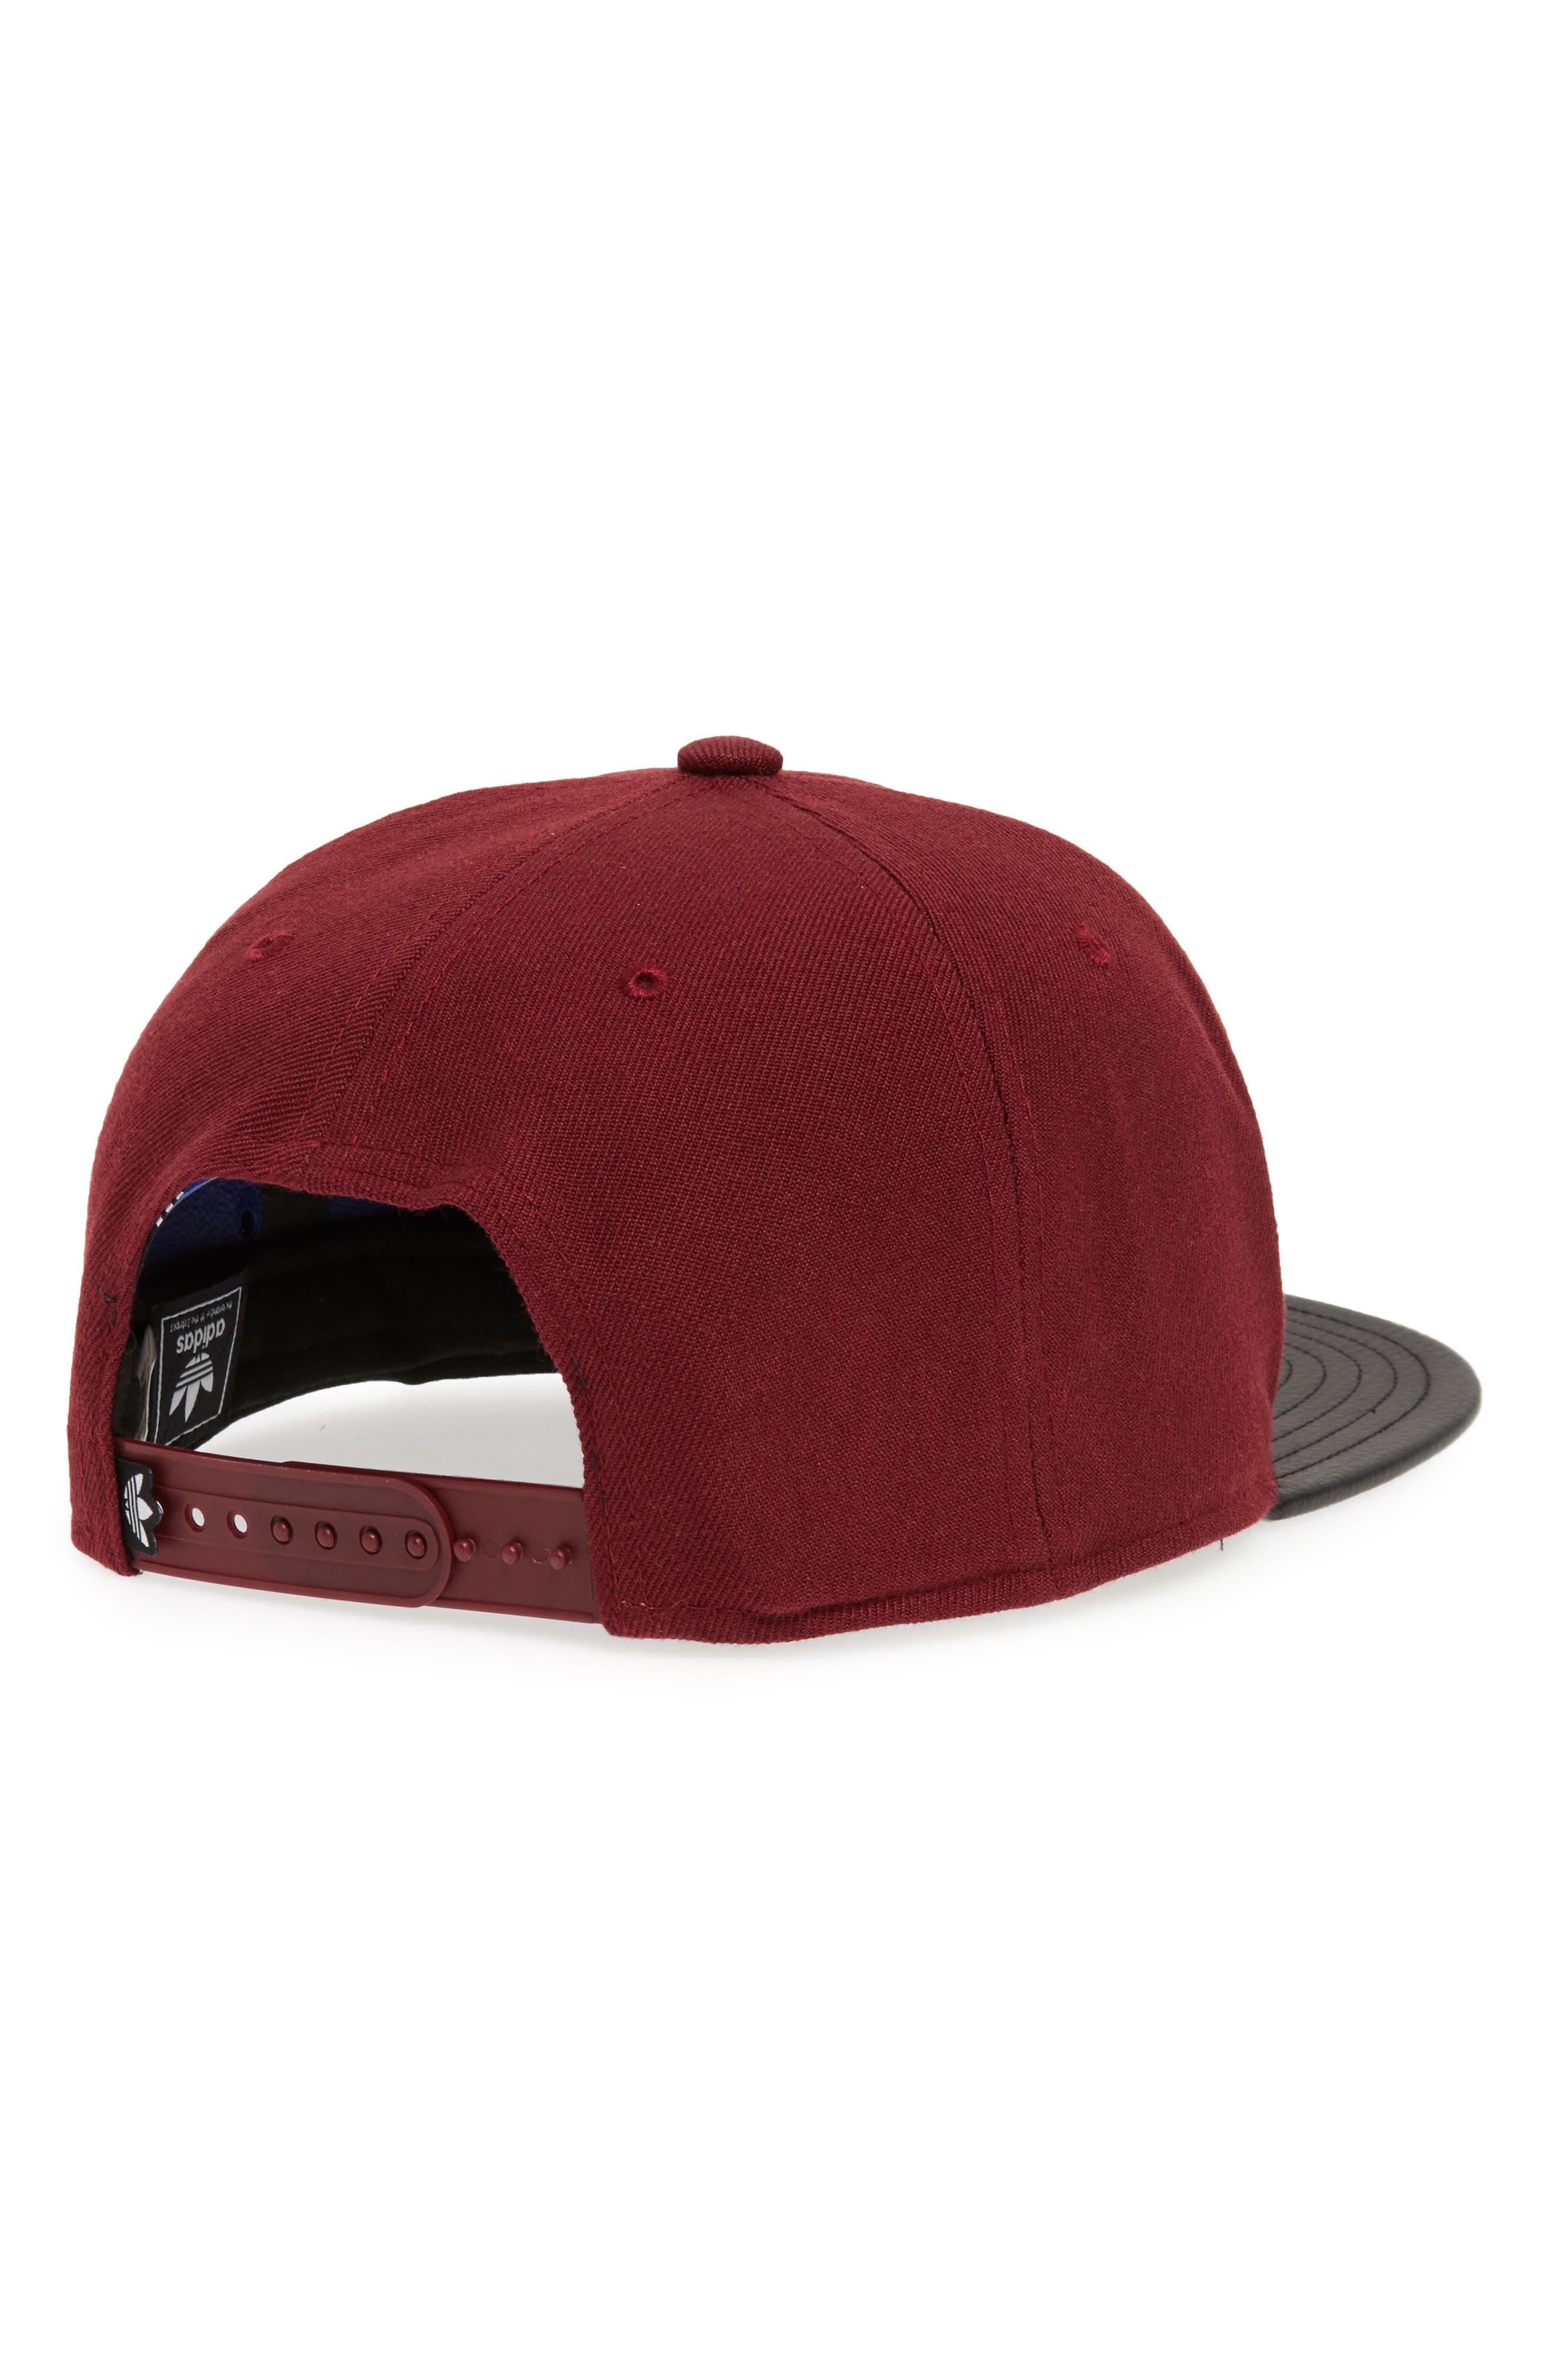 Ori Trefoil Plus Snapback Baseball Cap,                             Alternate thumbnail 2, color,                             Maroon/ Black Pu